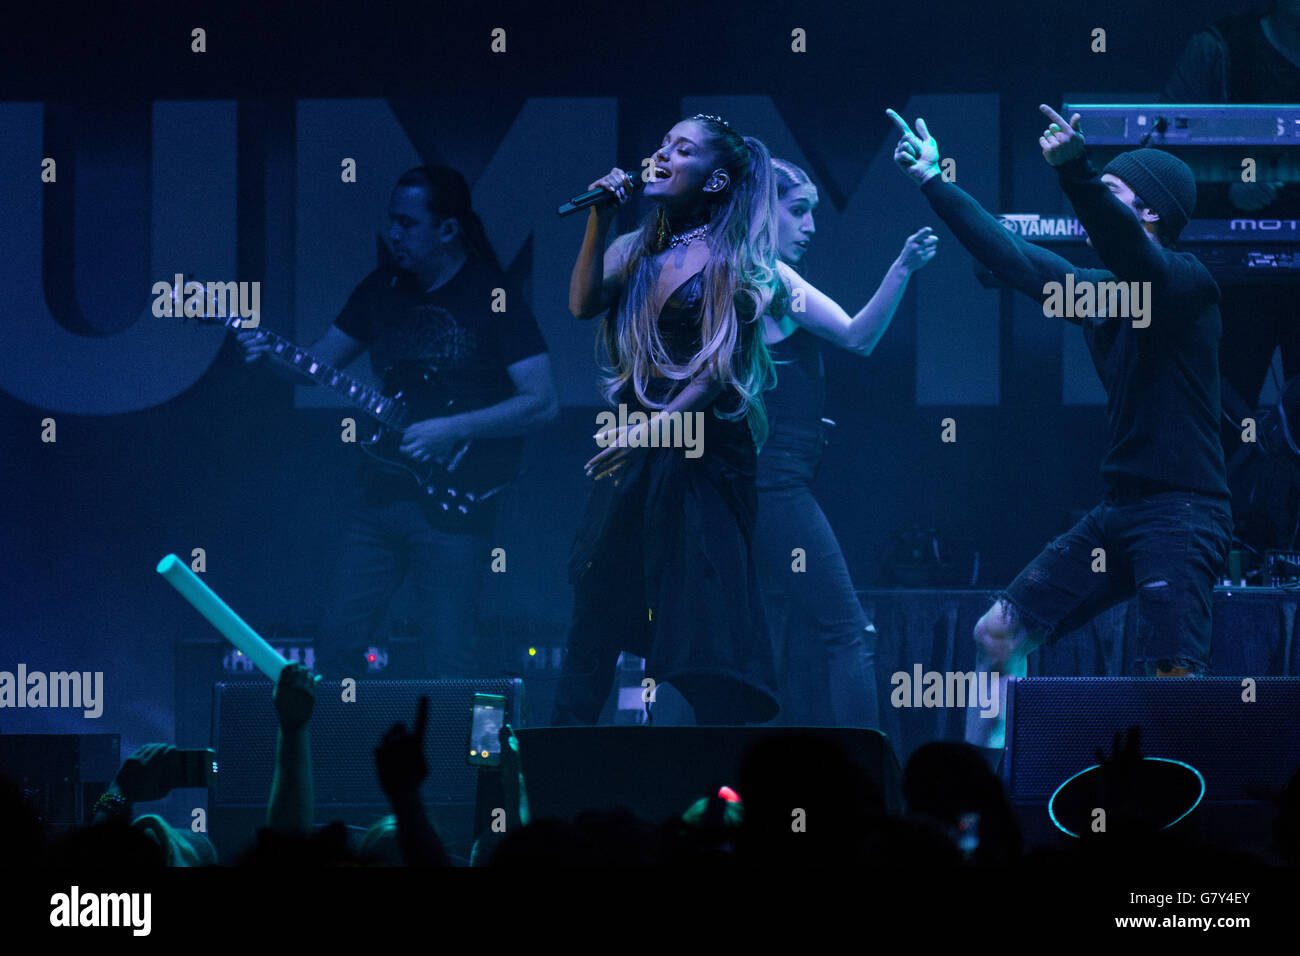 Ariana Grande Performs Live On Stockfotos & Ariana Grande Performs ...